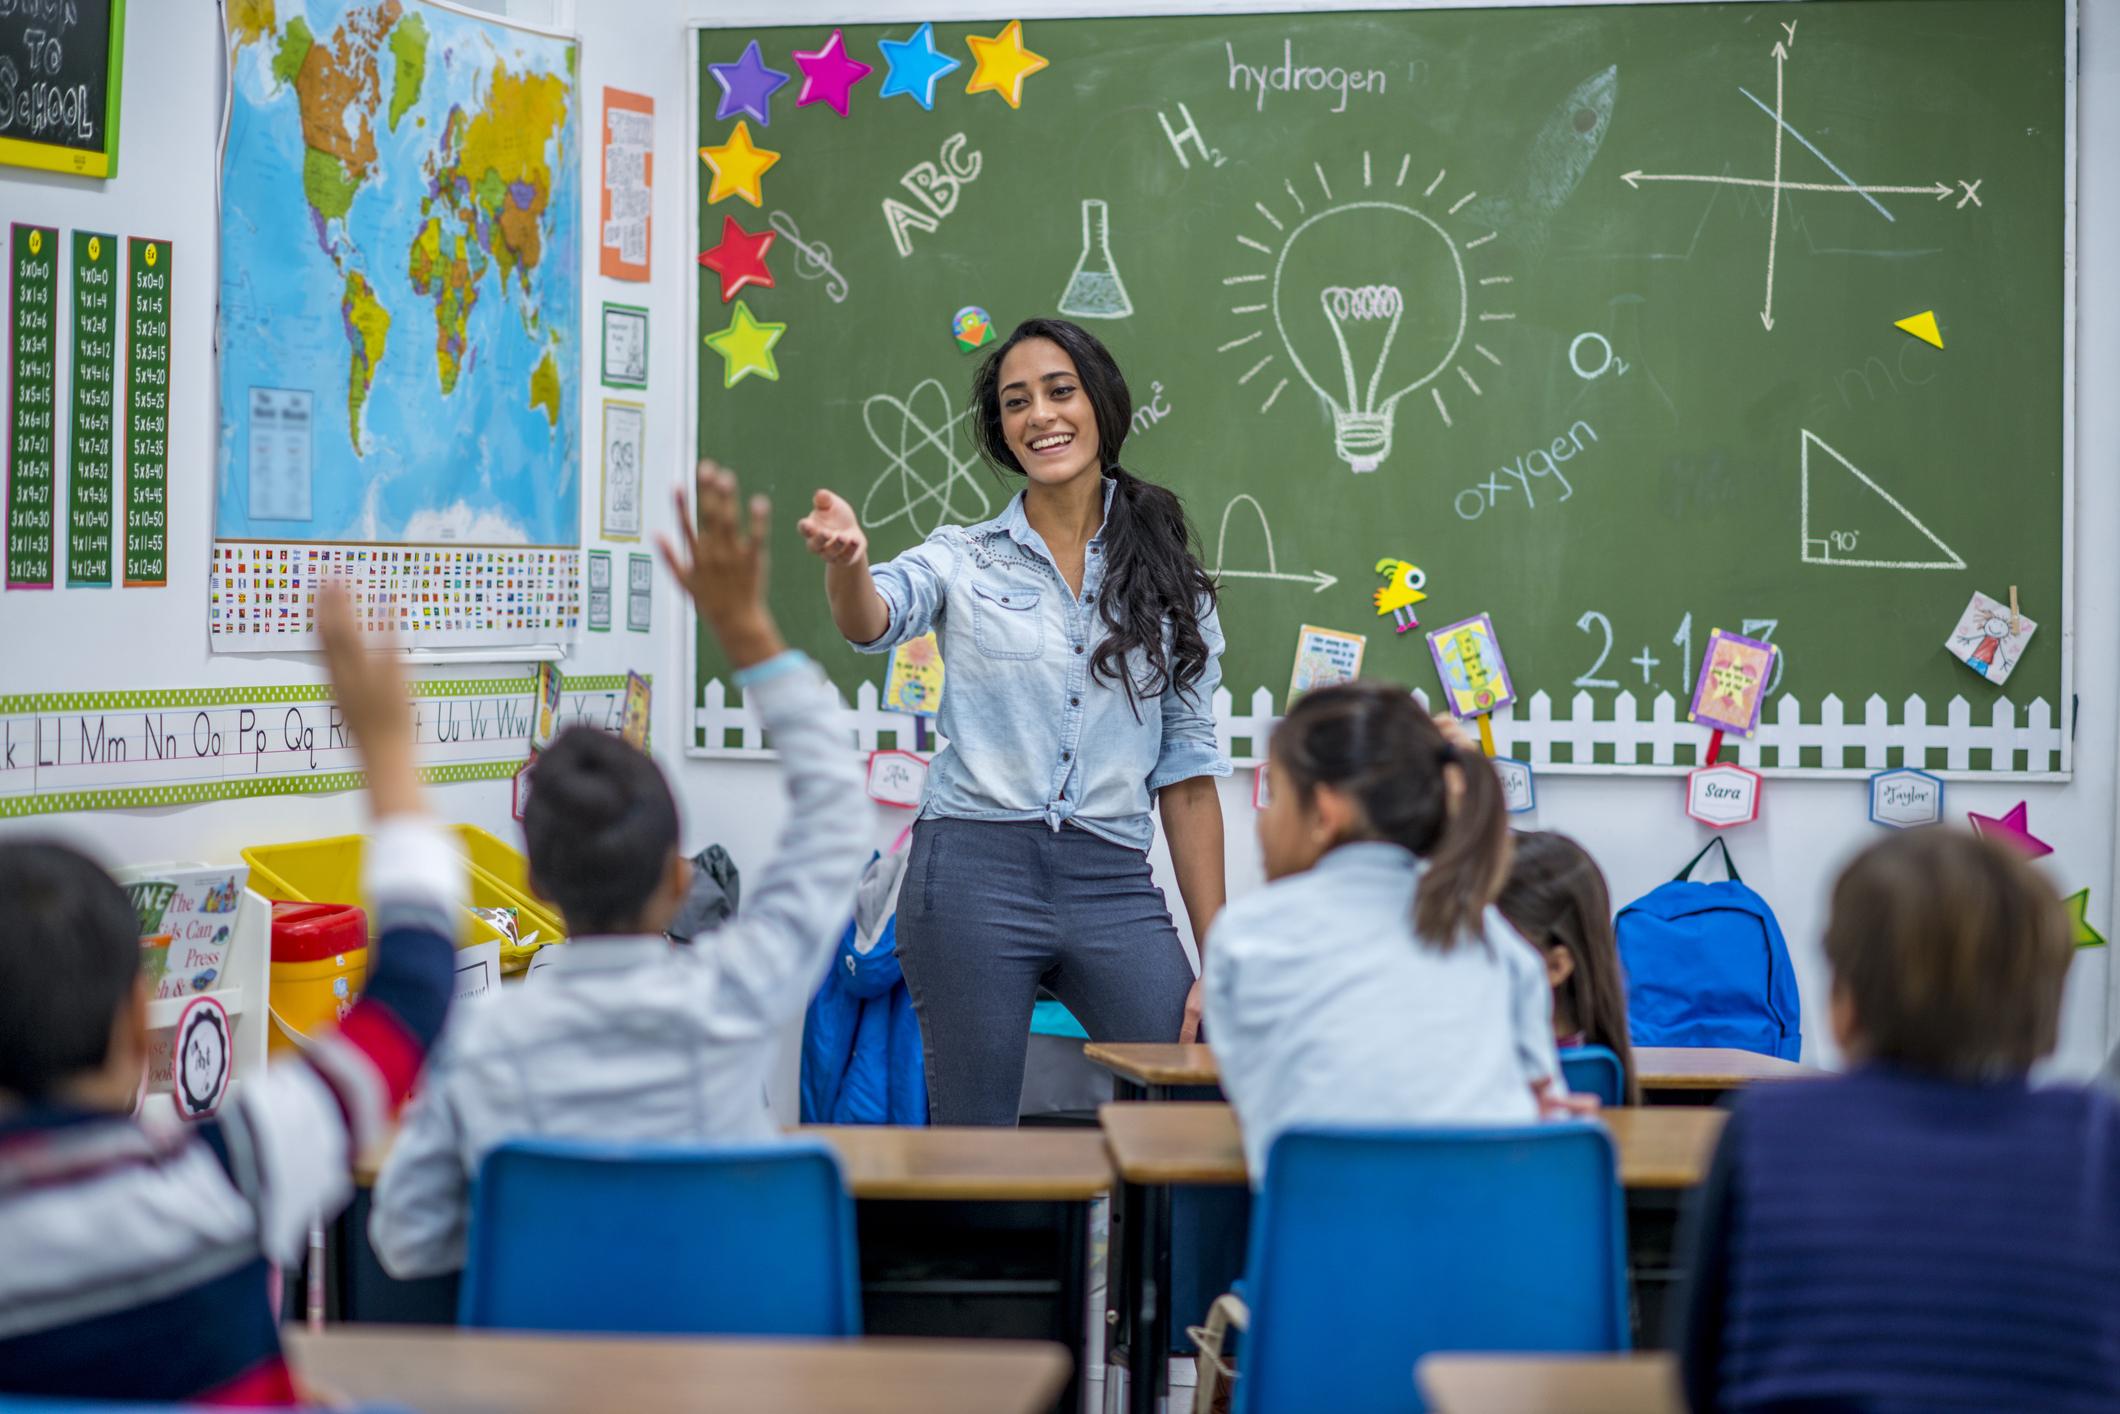 I Love Appreciating Teachers, but PTA Plans are Cheesy